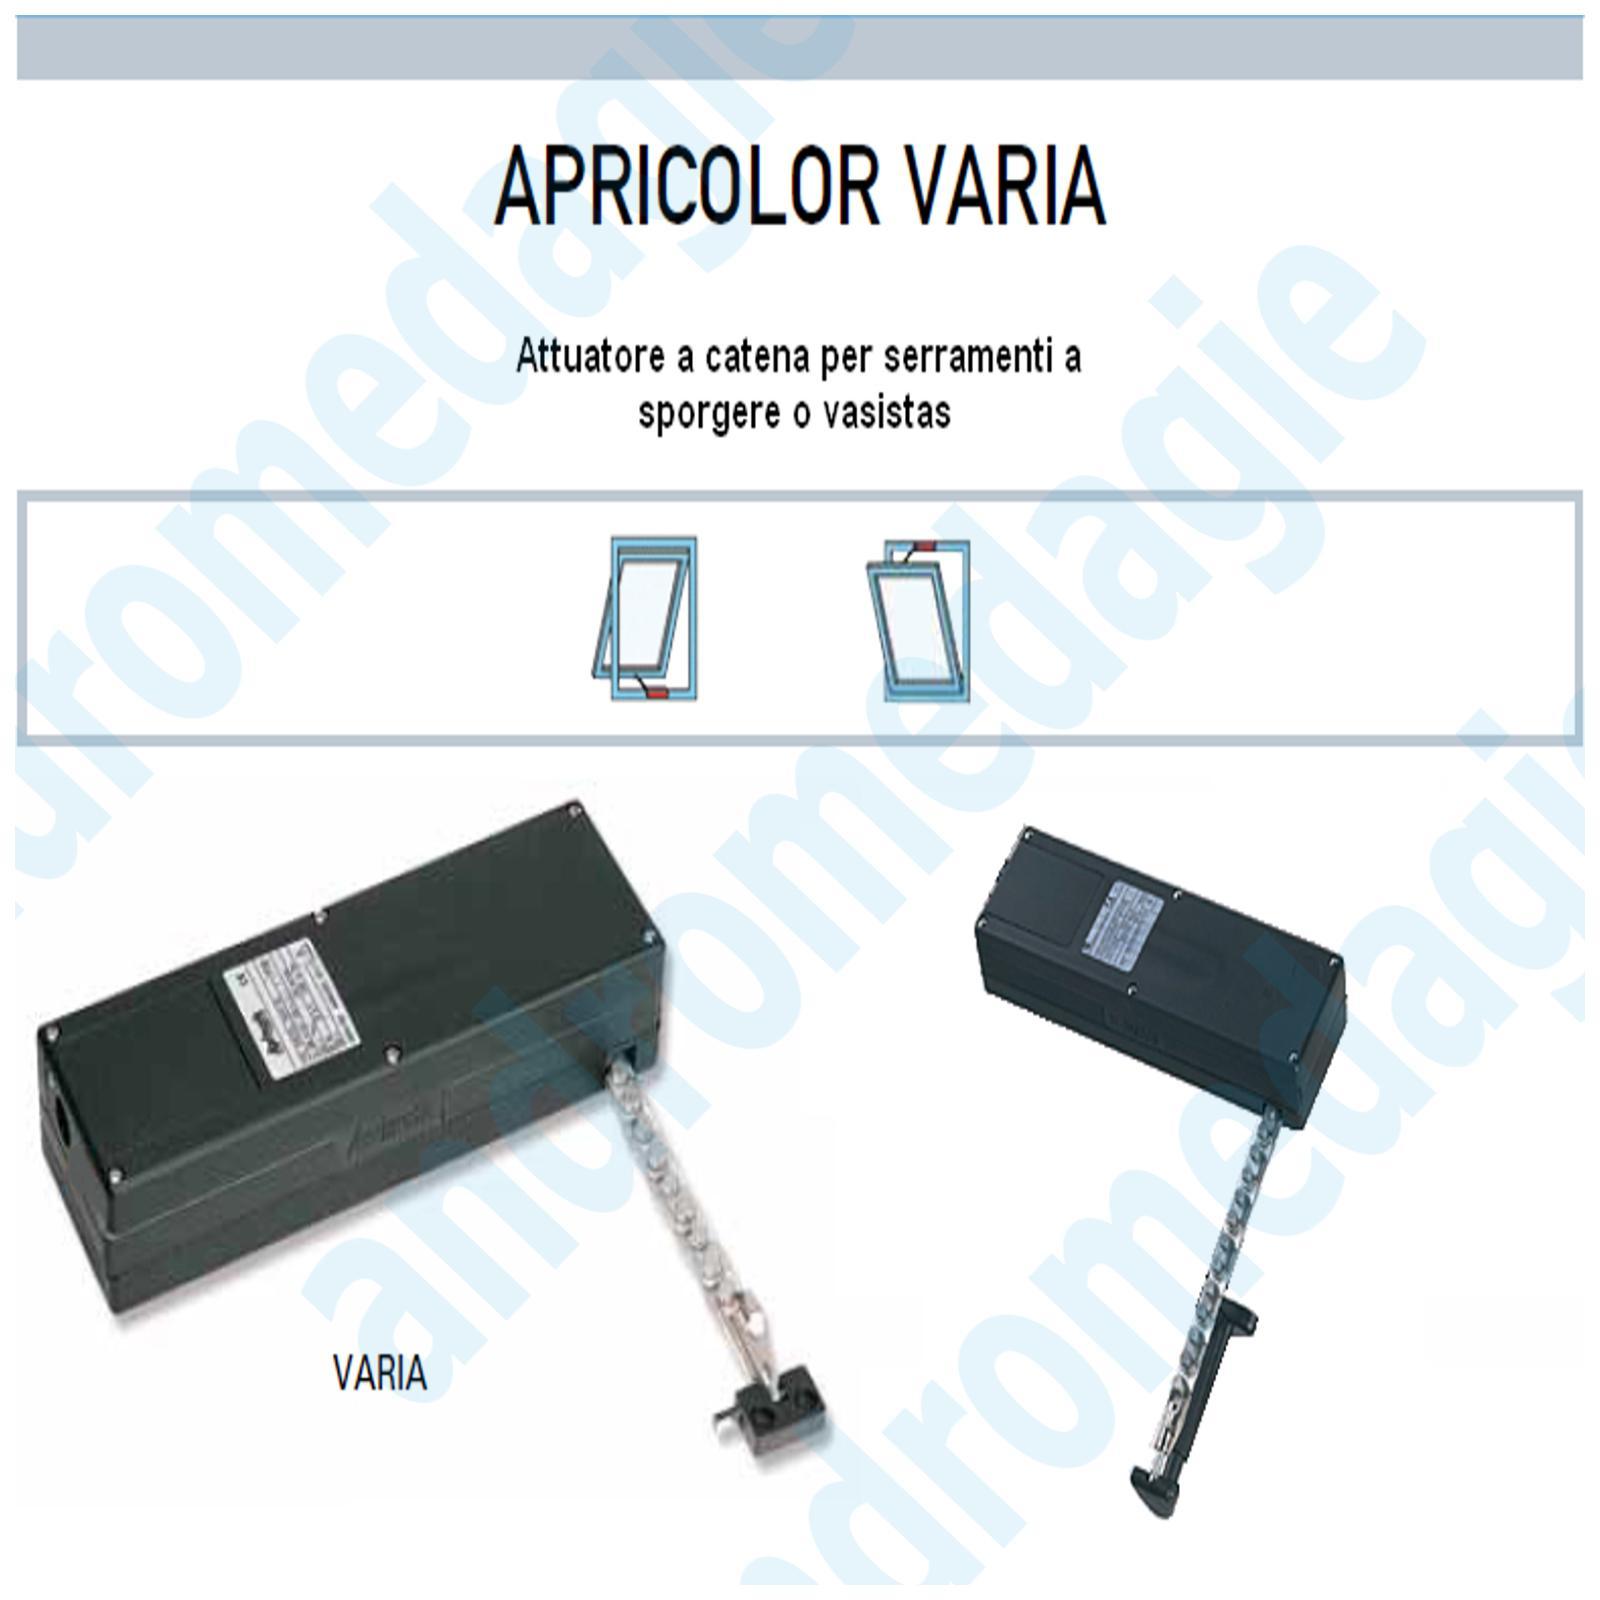 APRICOLOR VARIA 230V GRIGIO + ENTRAMBI I KIT SPORGERE/VASISTAS